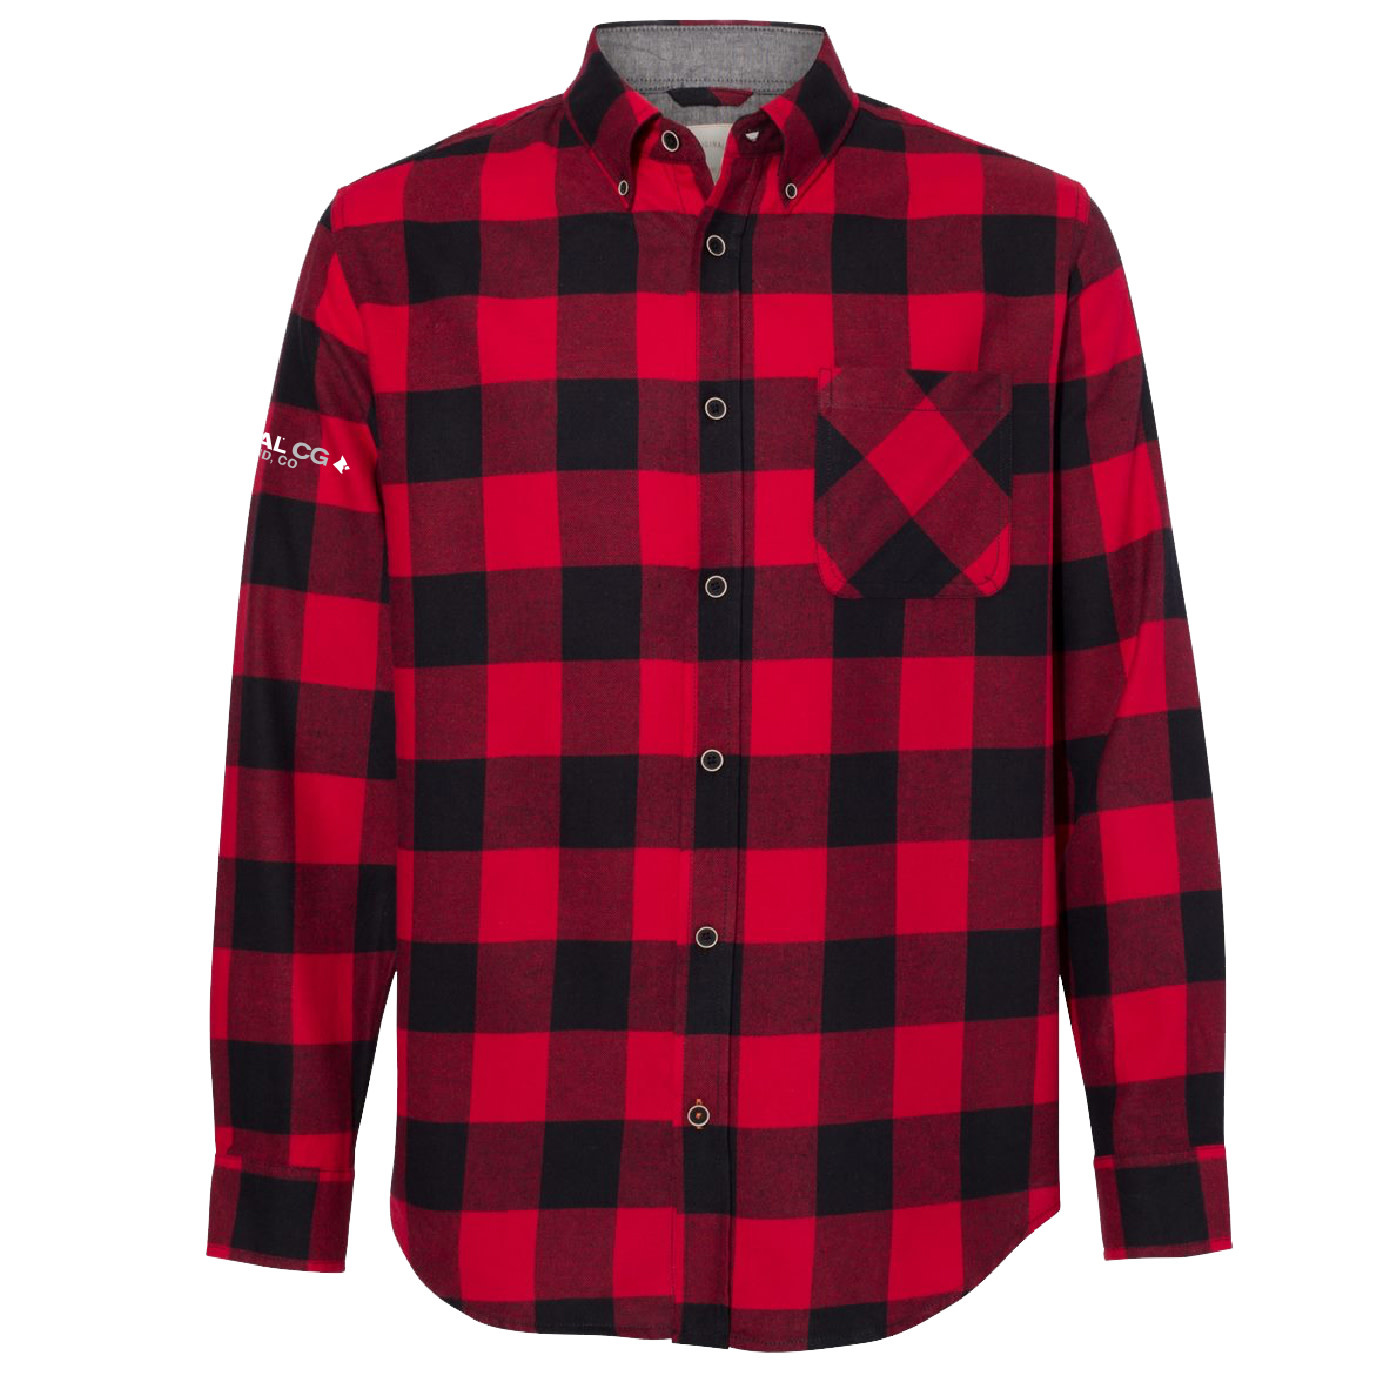 Weatherproof Weatherproof Vintage Brushed Flannel Long Sleeve Shirt (Crimson/Black)